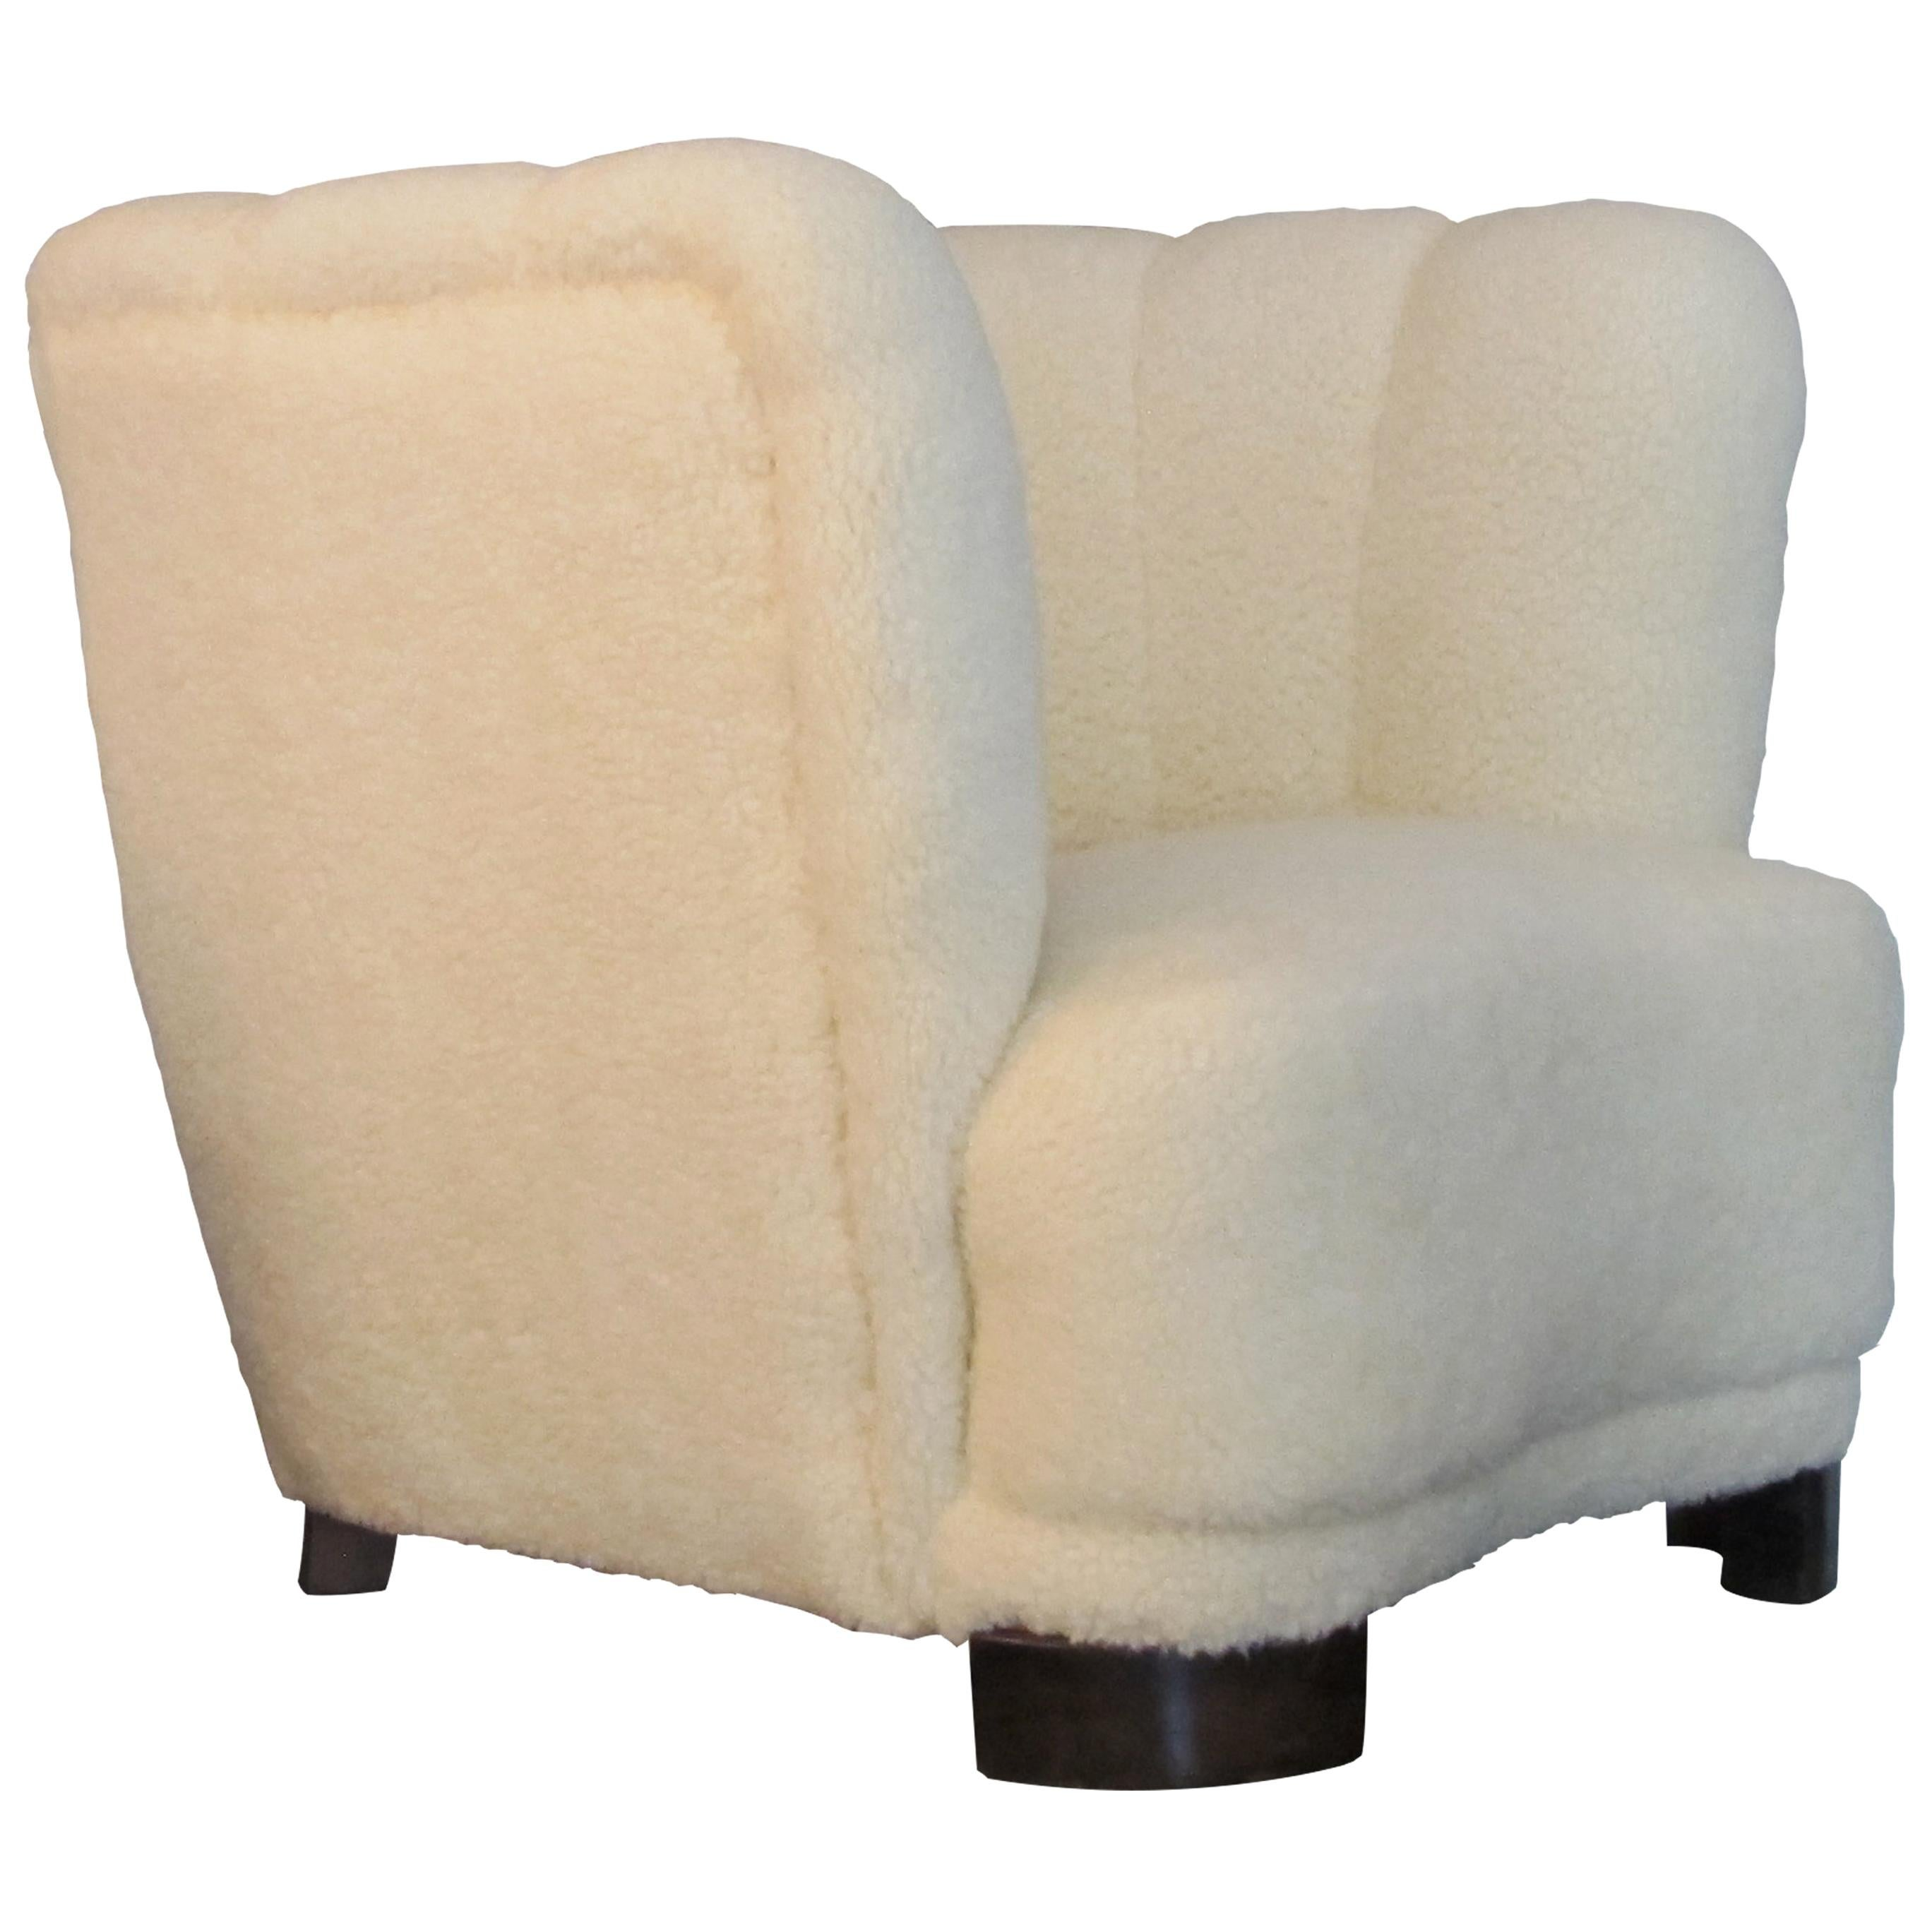 Swedish, 1930s Art Deco Single Club Armchair Newly Upholstered, Lambskin Fabric